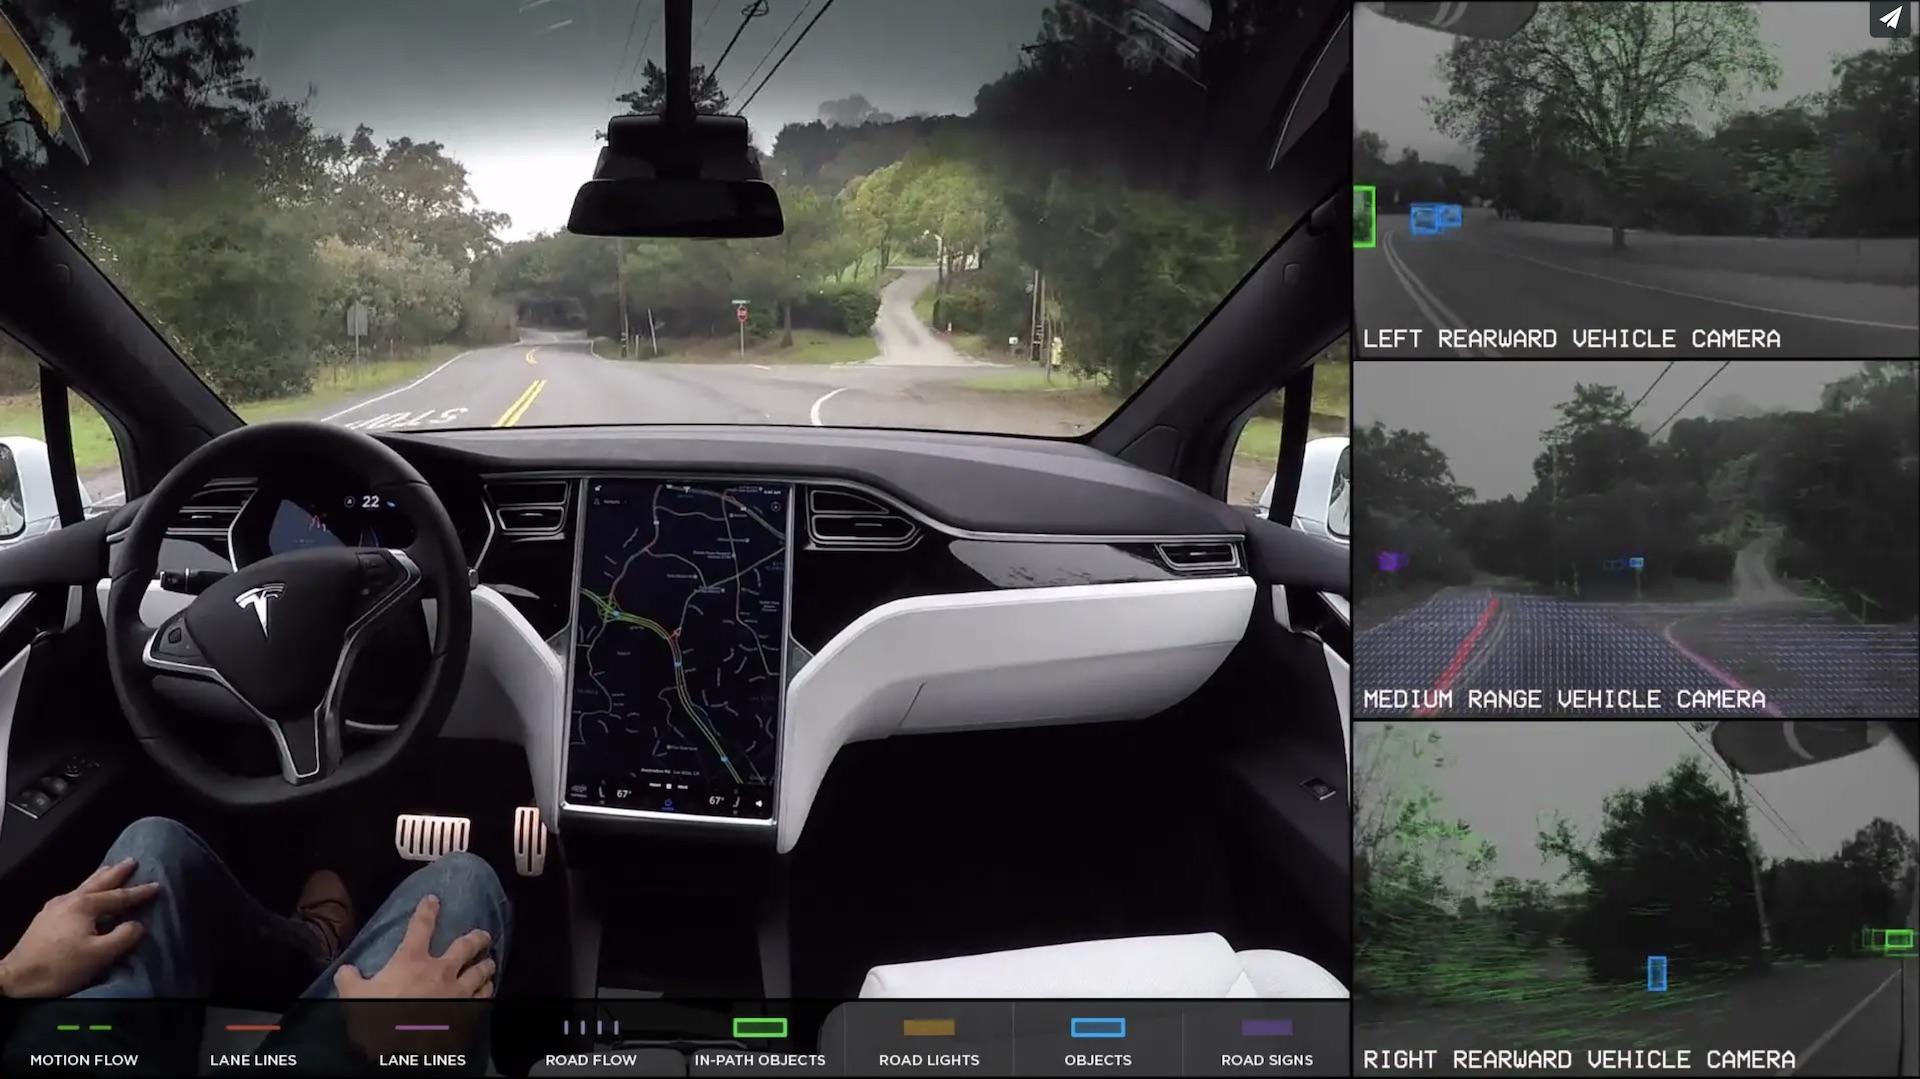 Tesla's autonomy event: Impressive progress with an